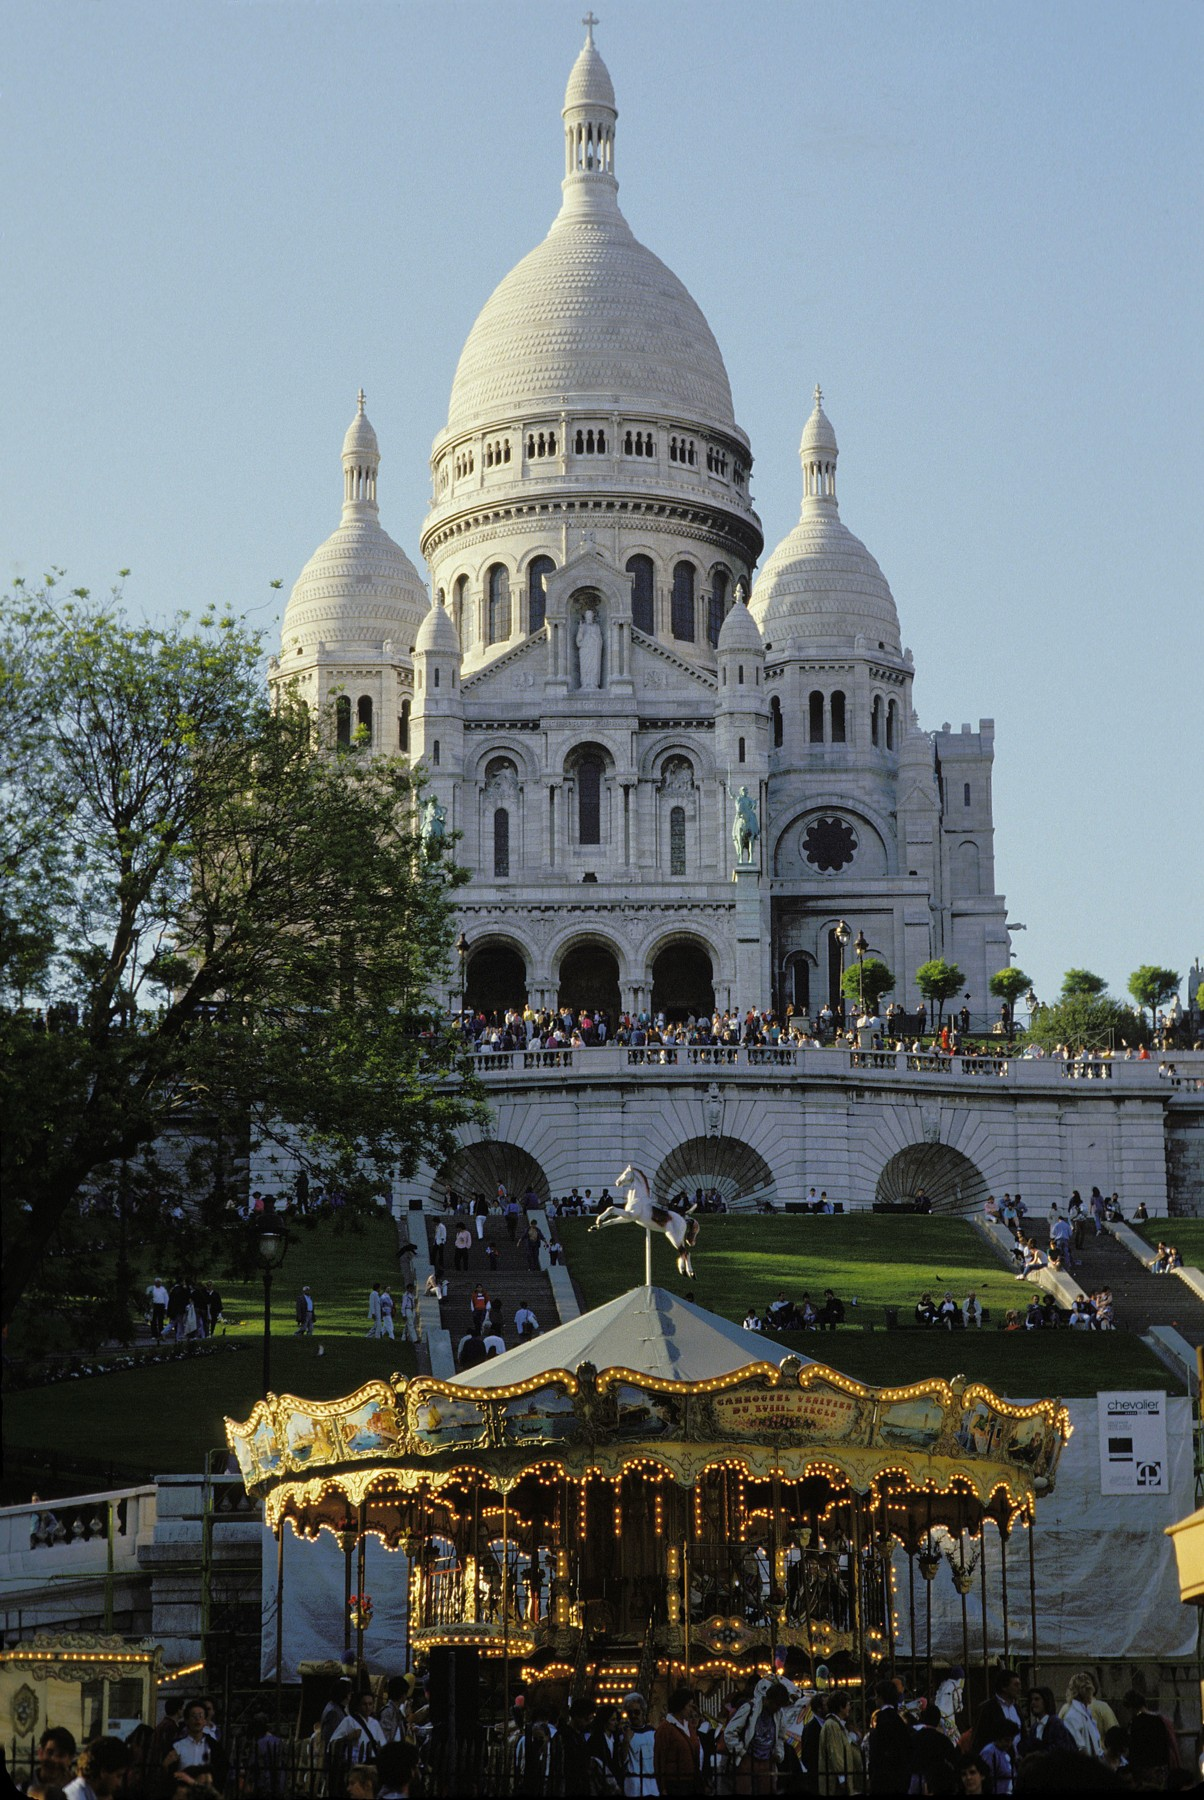 Montmartre - Sacre Coeur